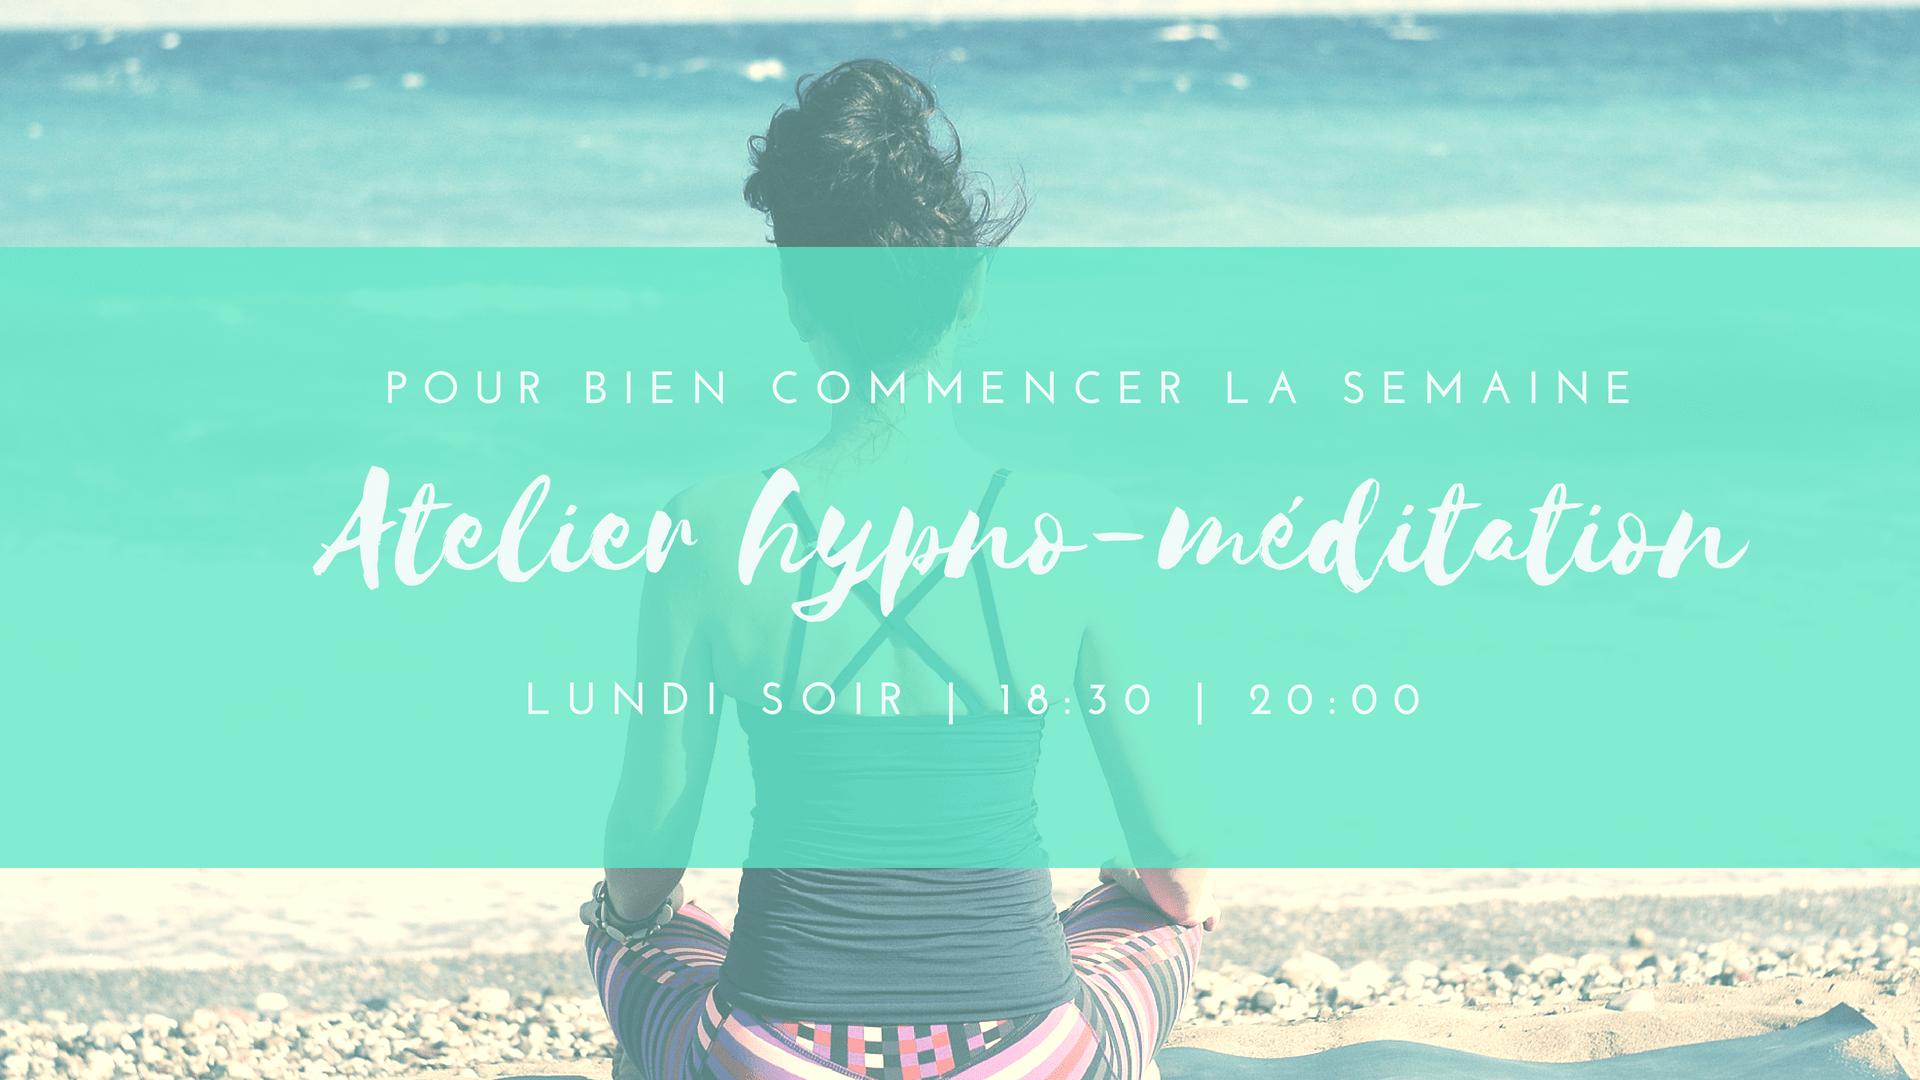 Atelier d'hypno-méditation du lundi soir